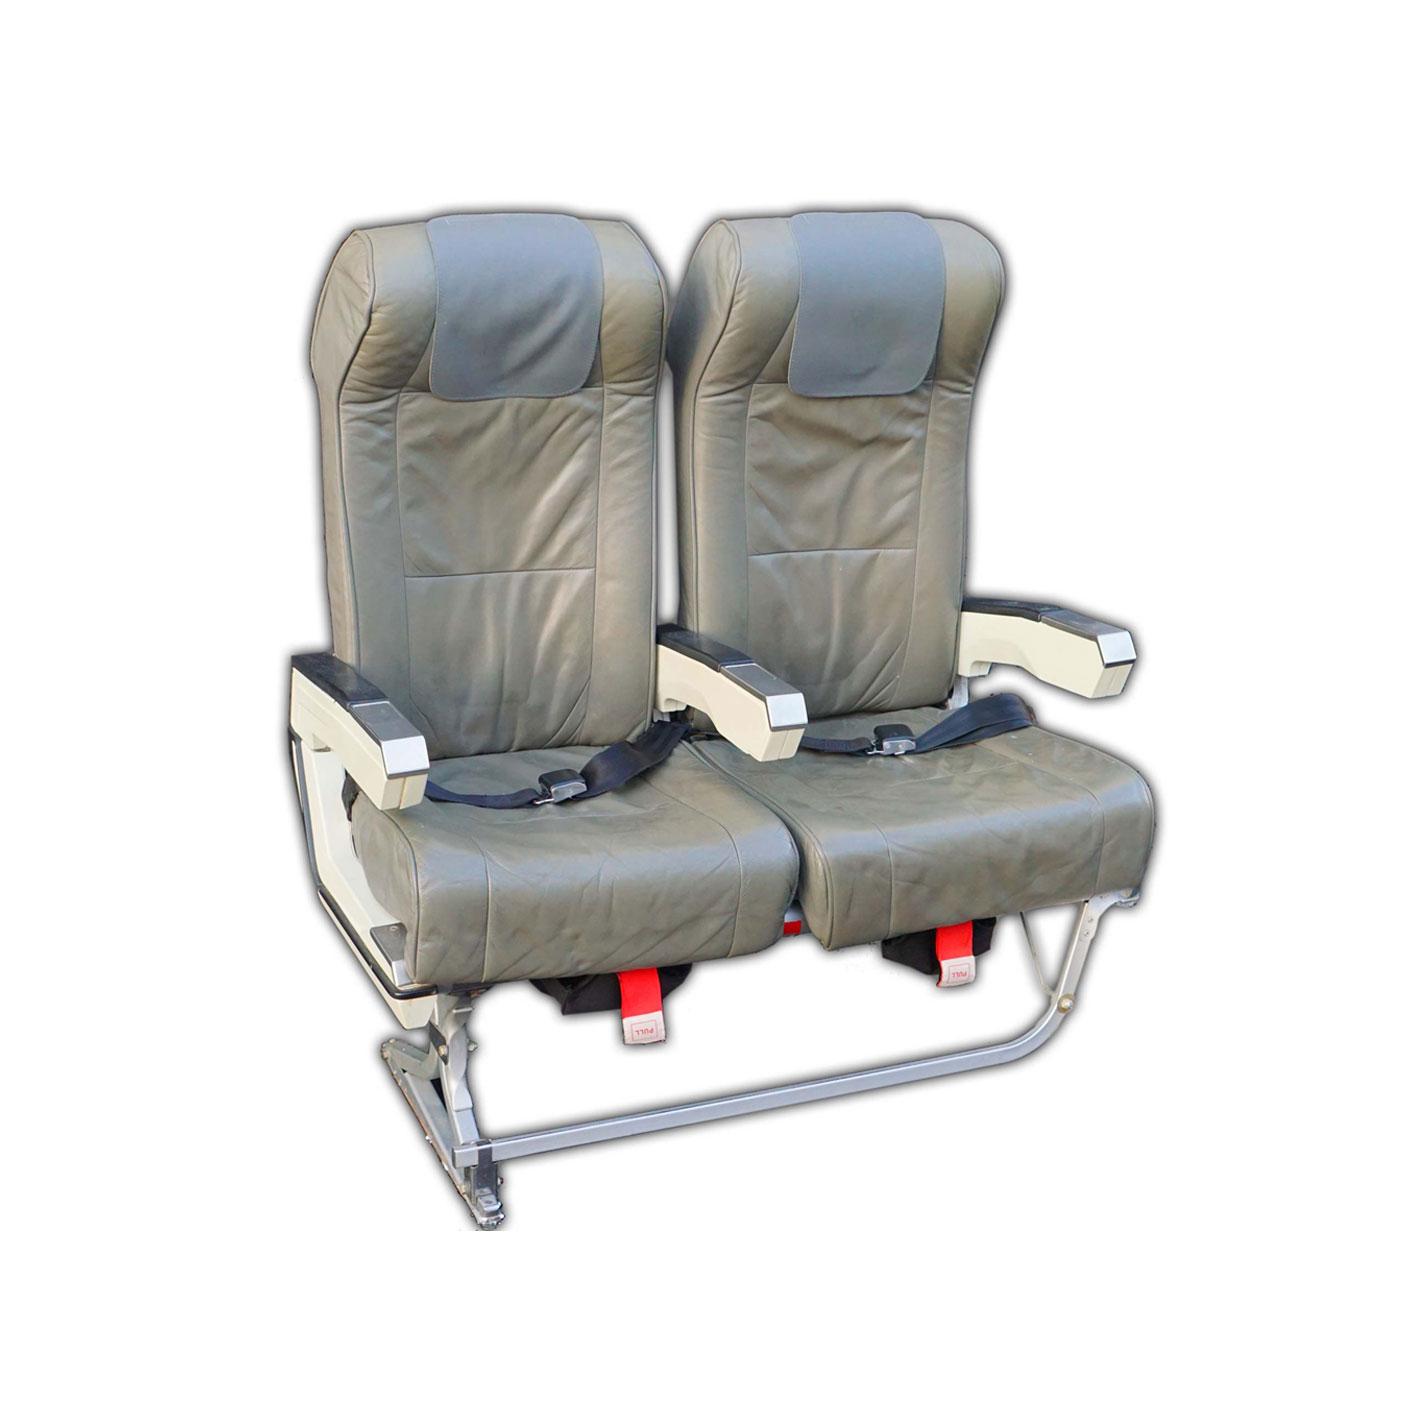 2er Flugzeugsitz-Bank Leder grau